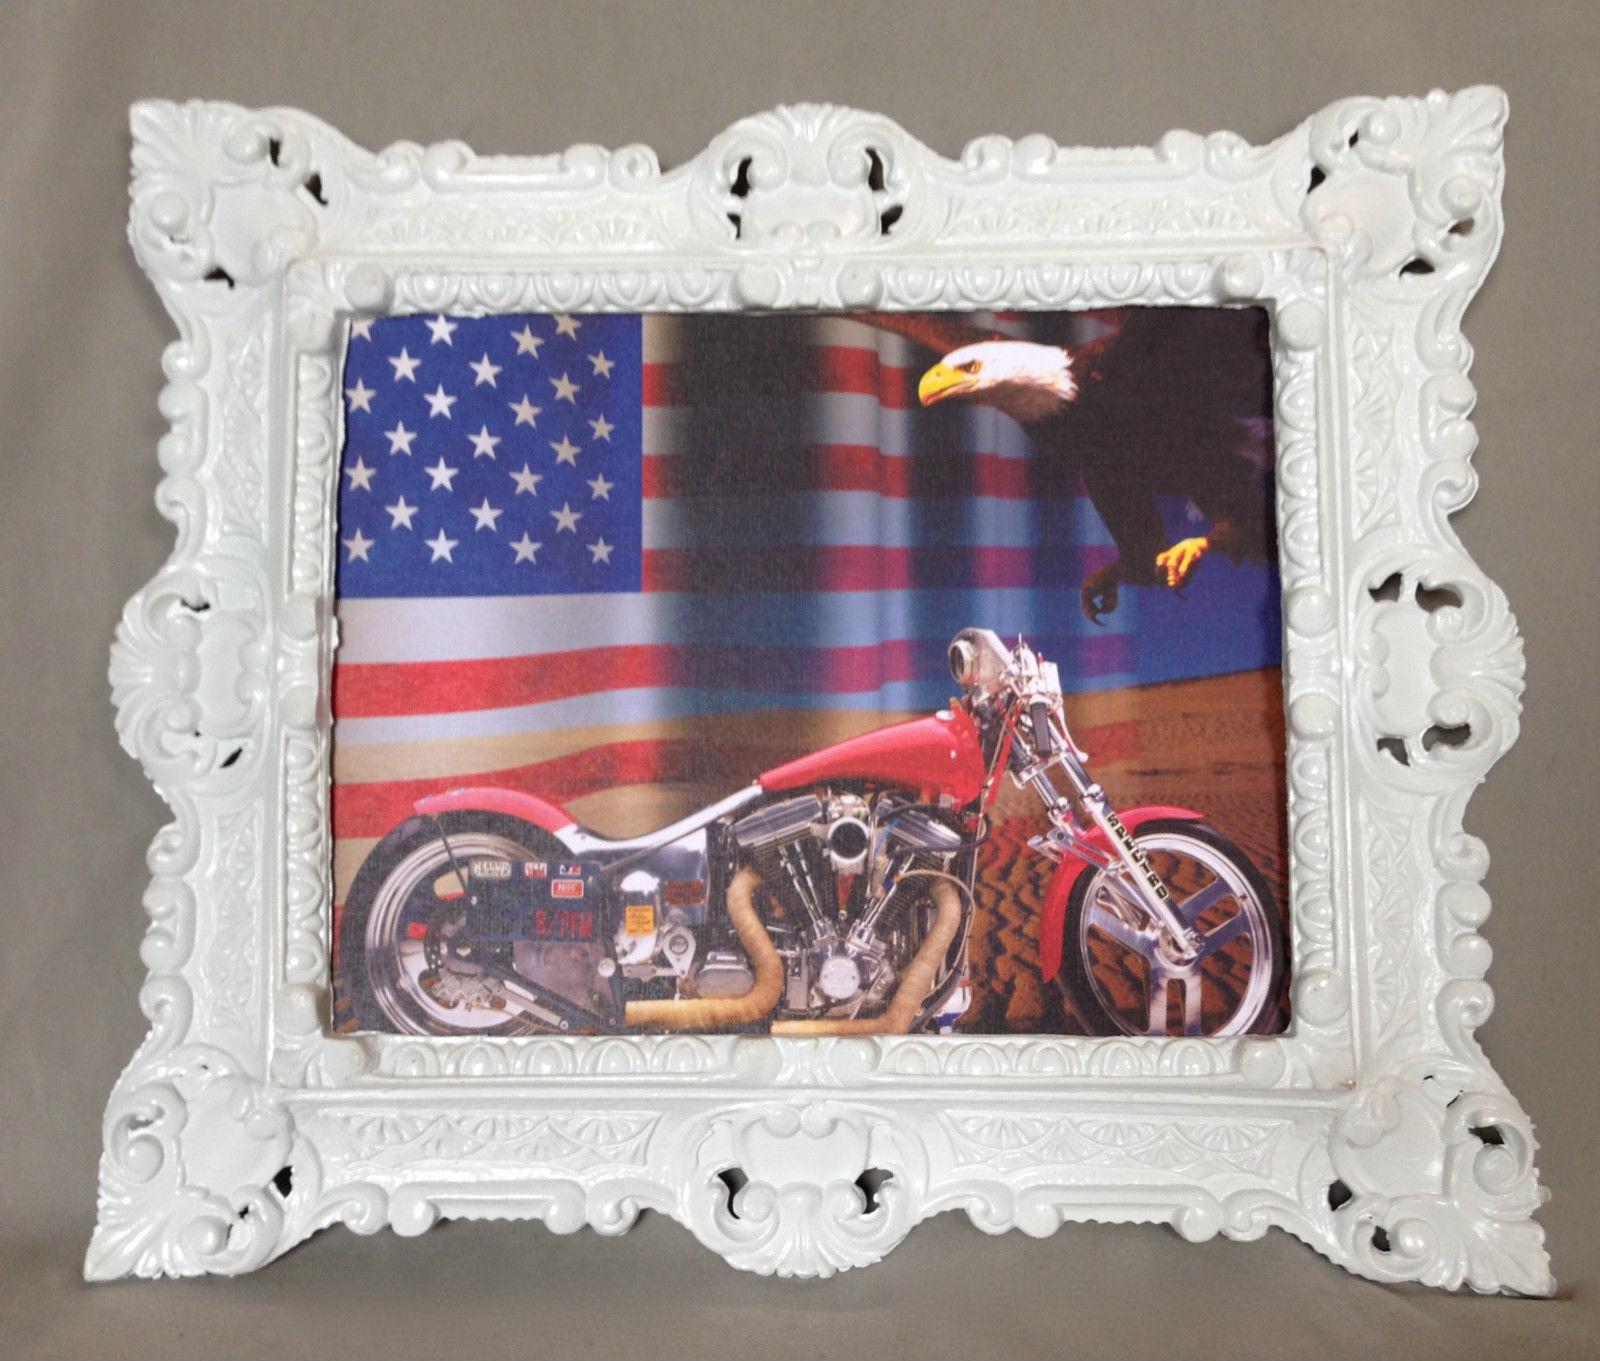 Motorrad Chopper ROT mit Rahmen Adler Fahne Harley 45x38 Oldtimer ...